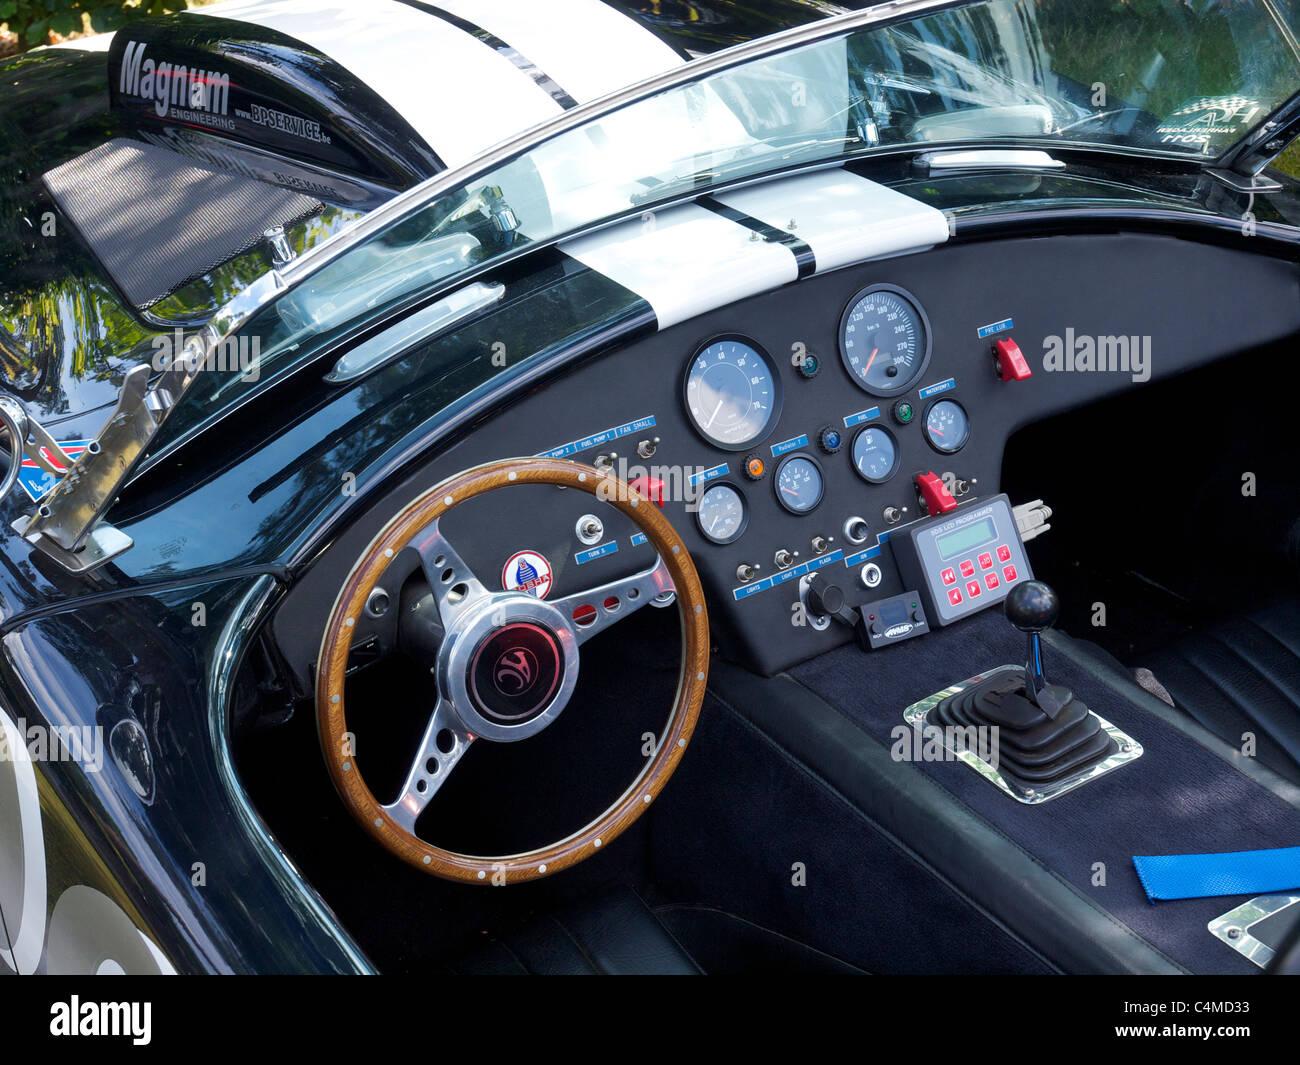 AC Cobra 427 cockpit dashboard race rallye equipped Stock Photo